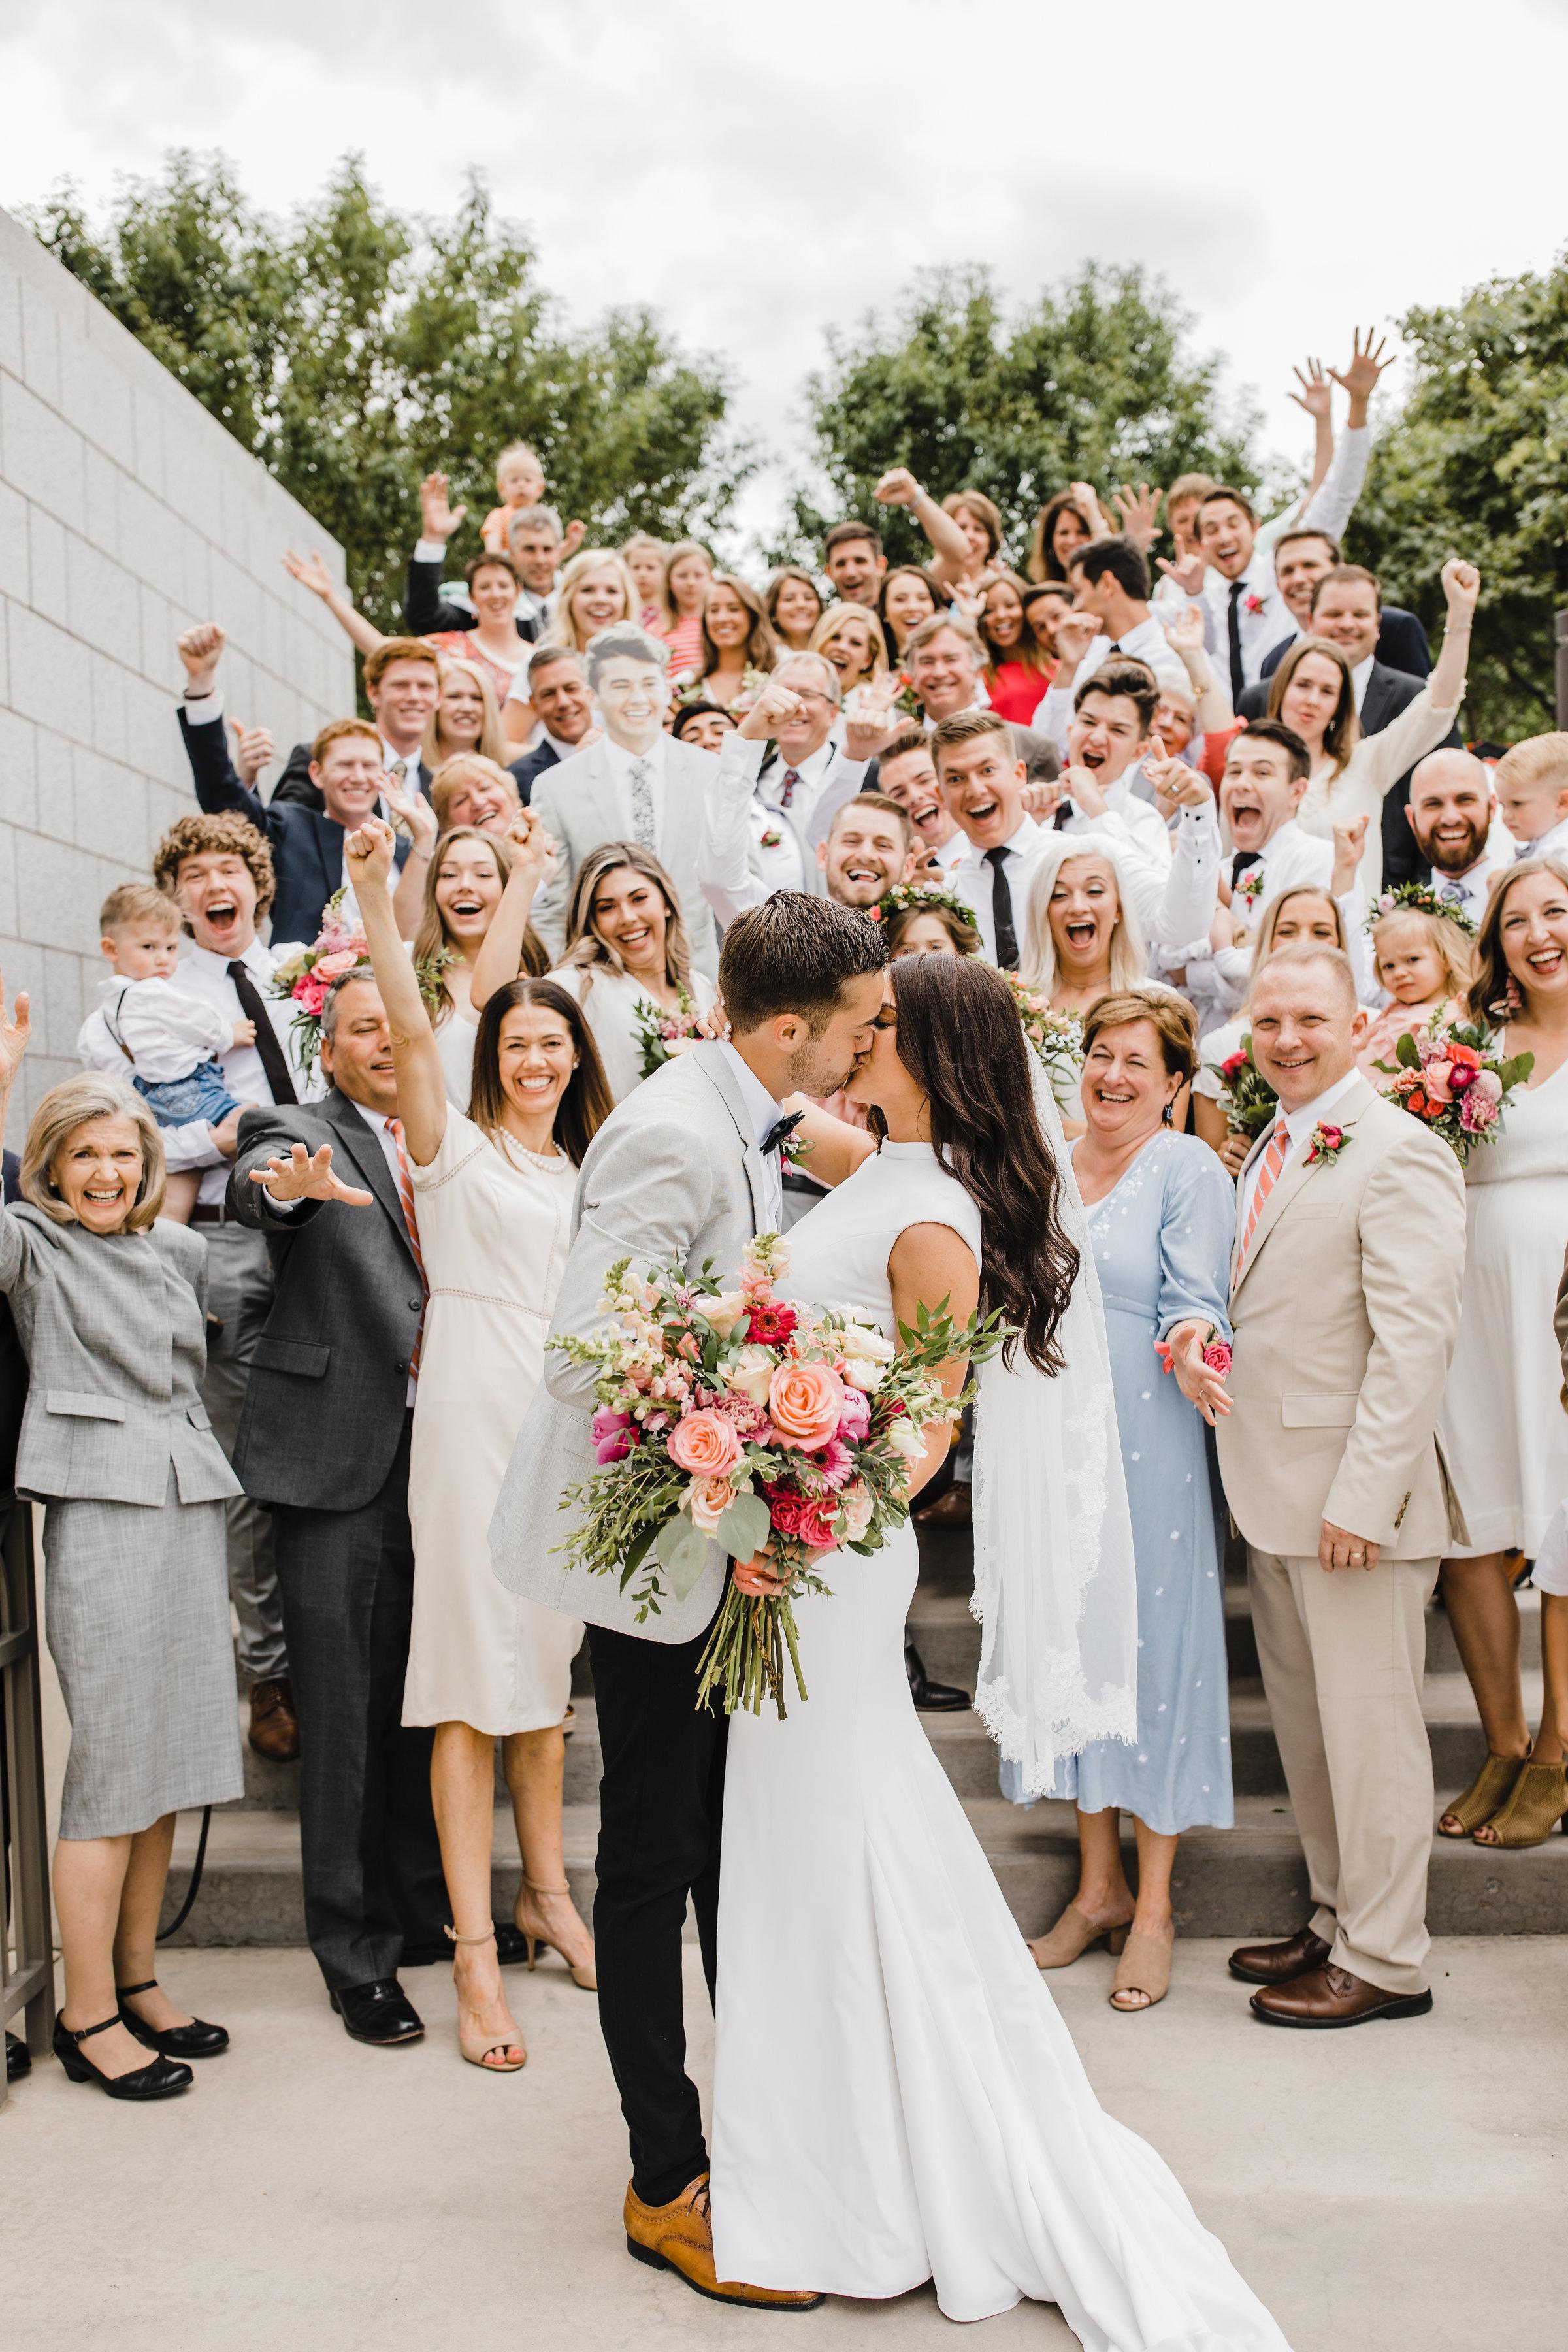 Draper utah wedding photographer wedding exit family cheering lds temple